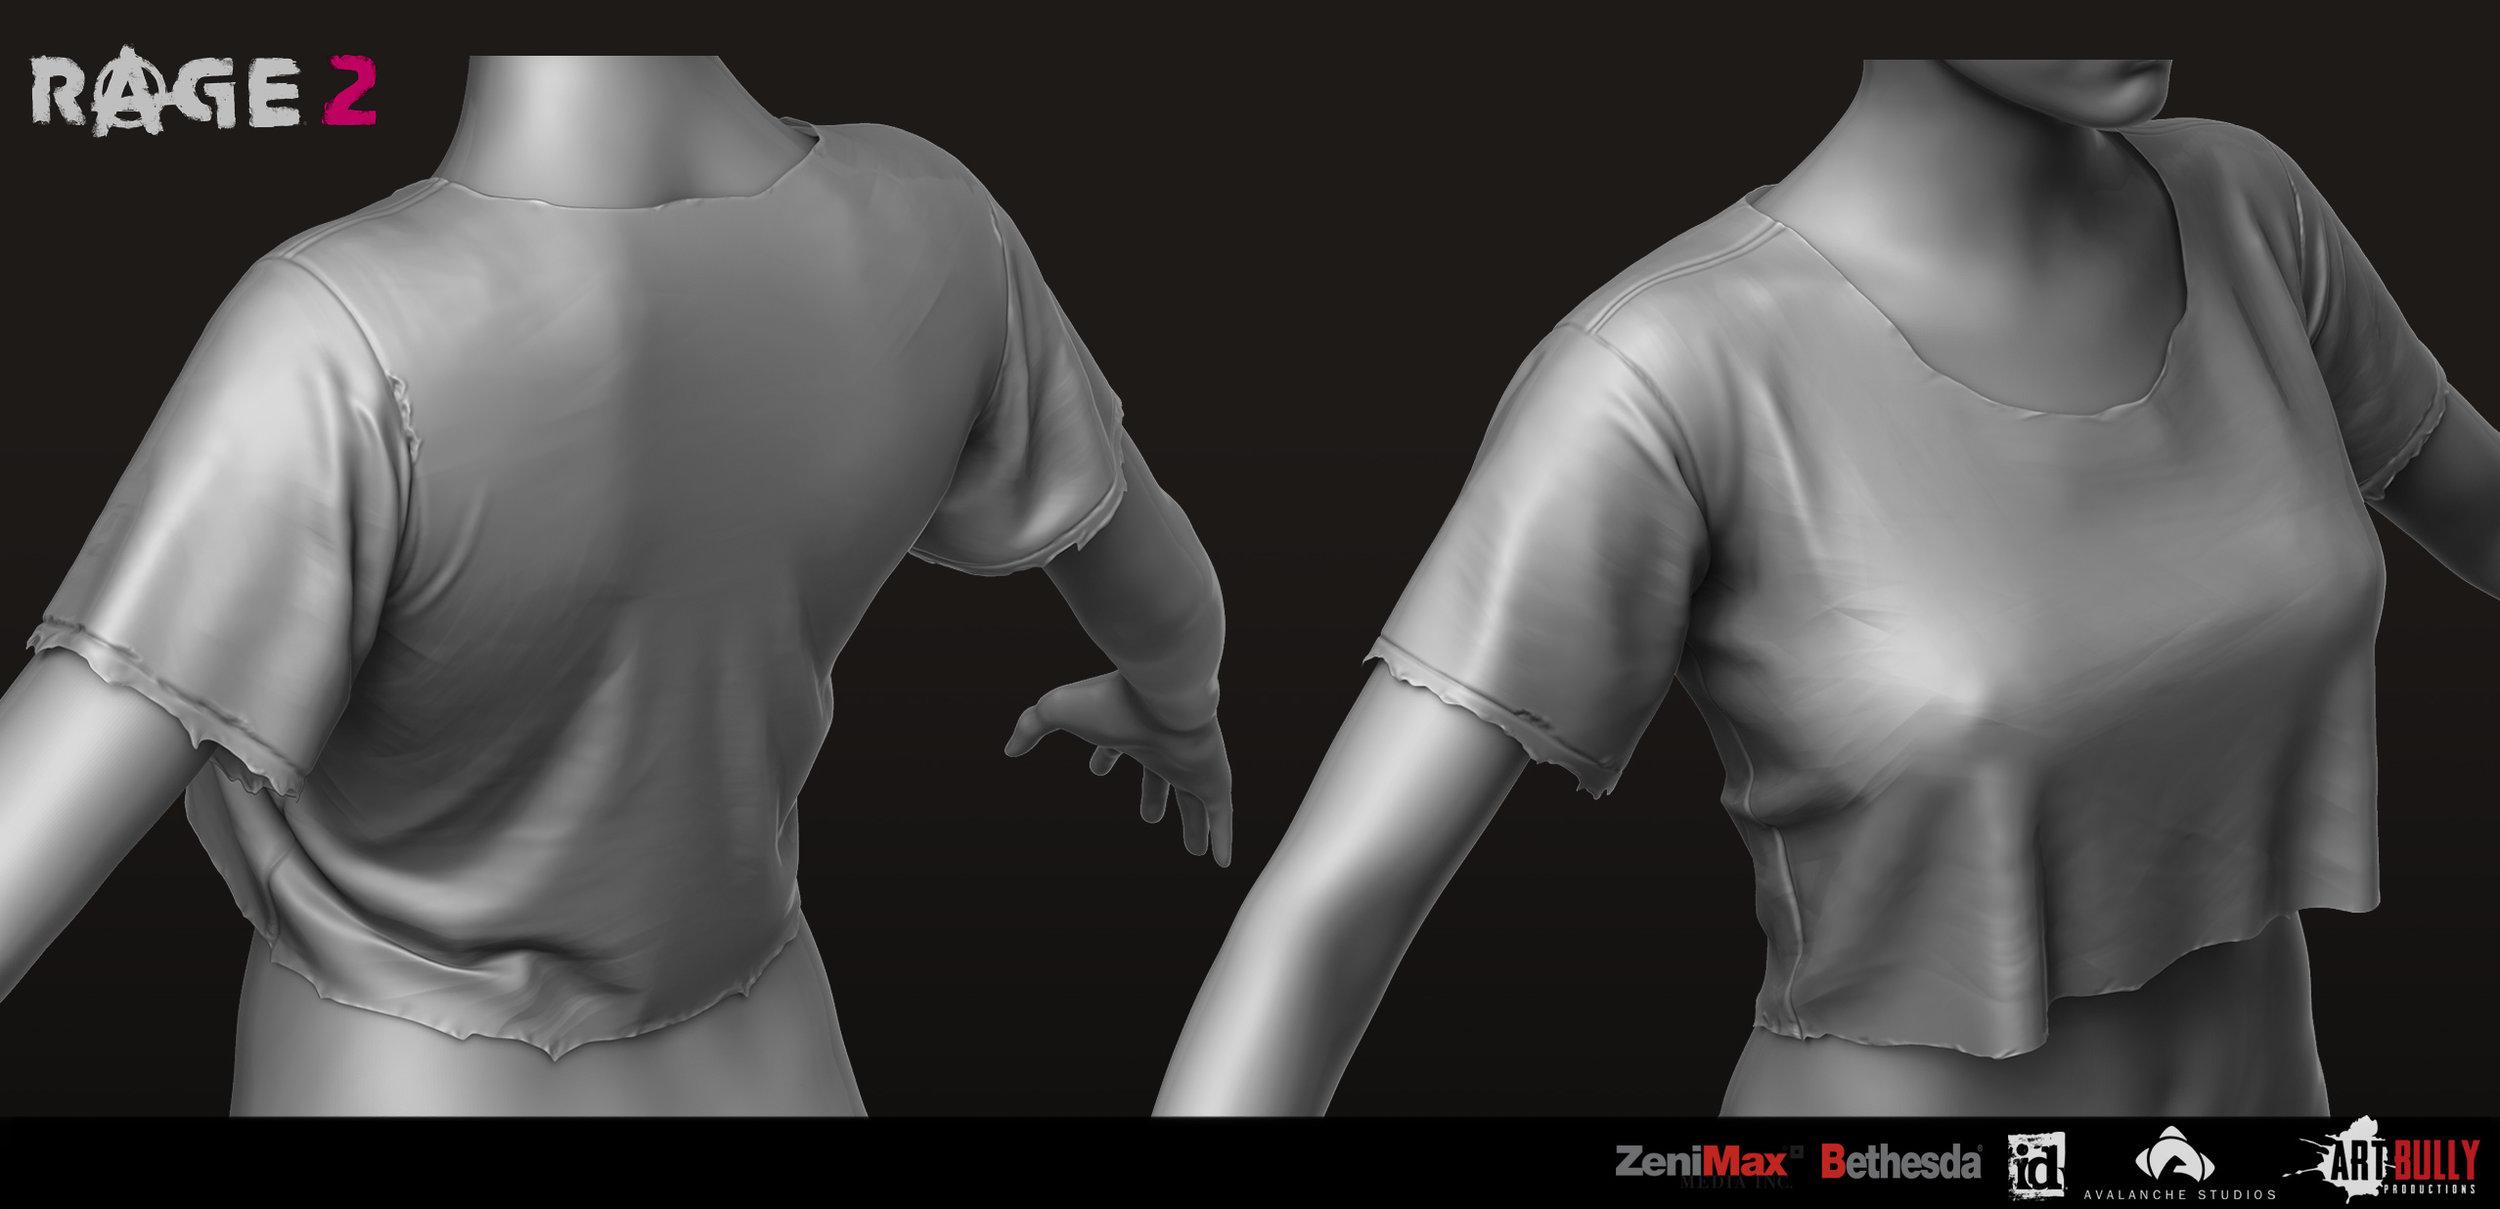 Civilian_Gear_Set_03_Tops_Accessories_02_Cutoff_Belly_Shirt_render.jpg